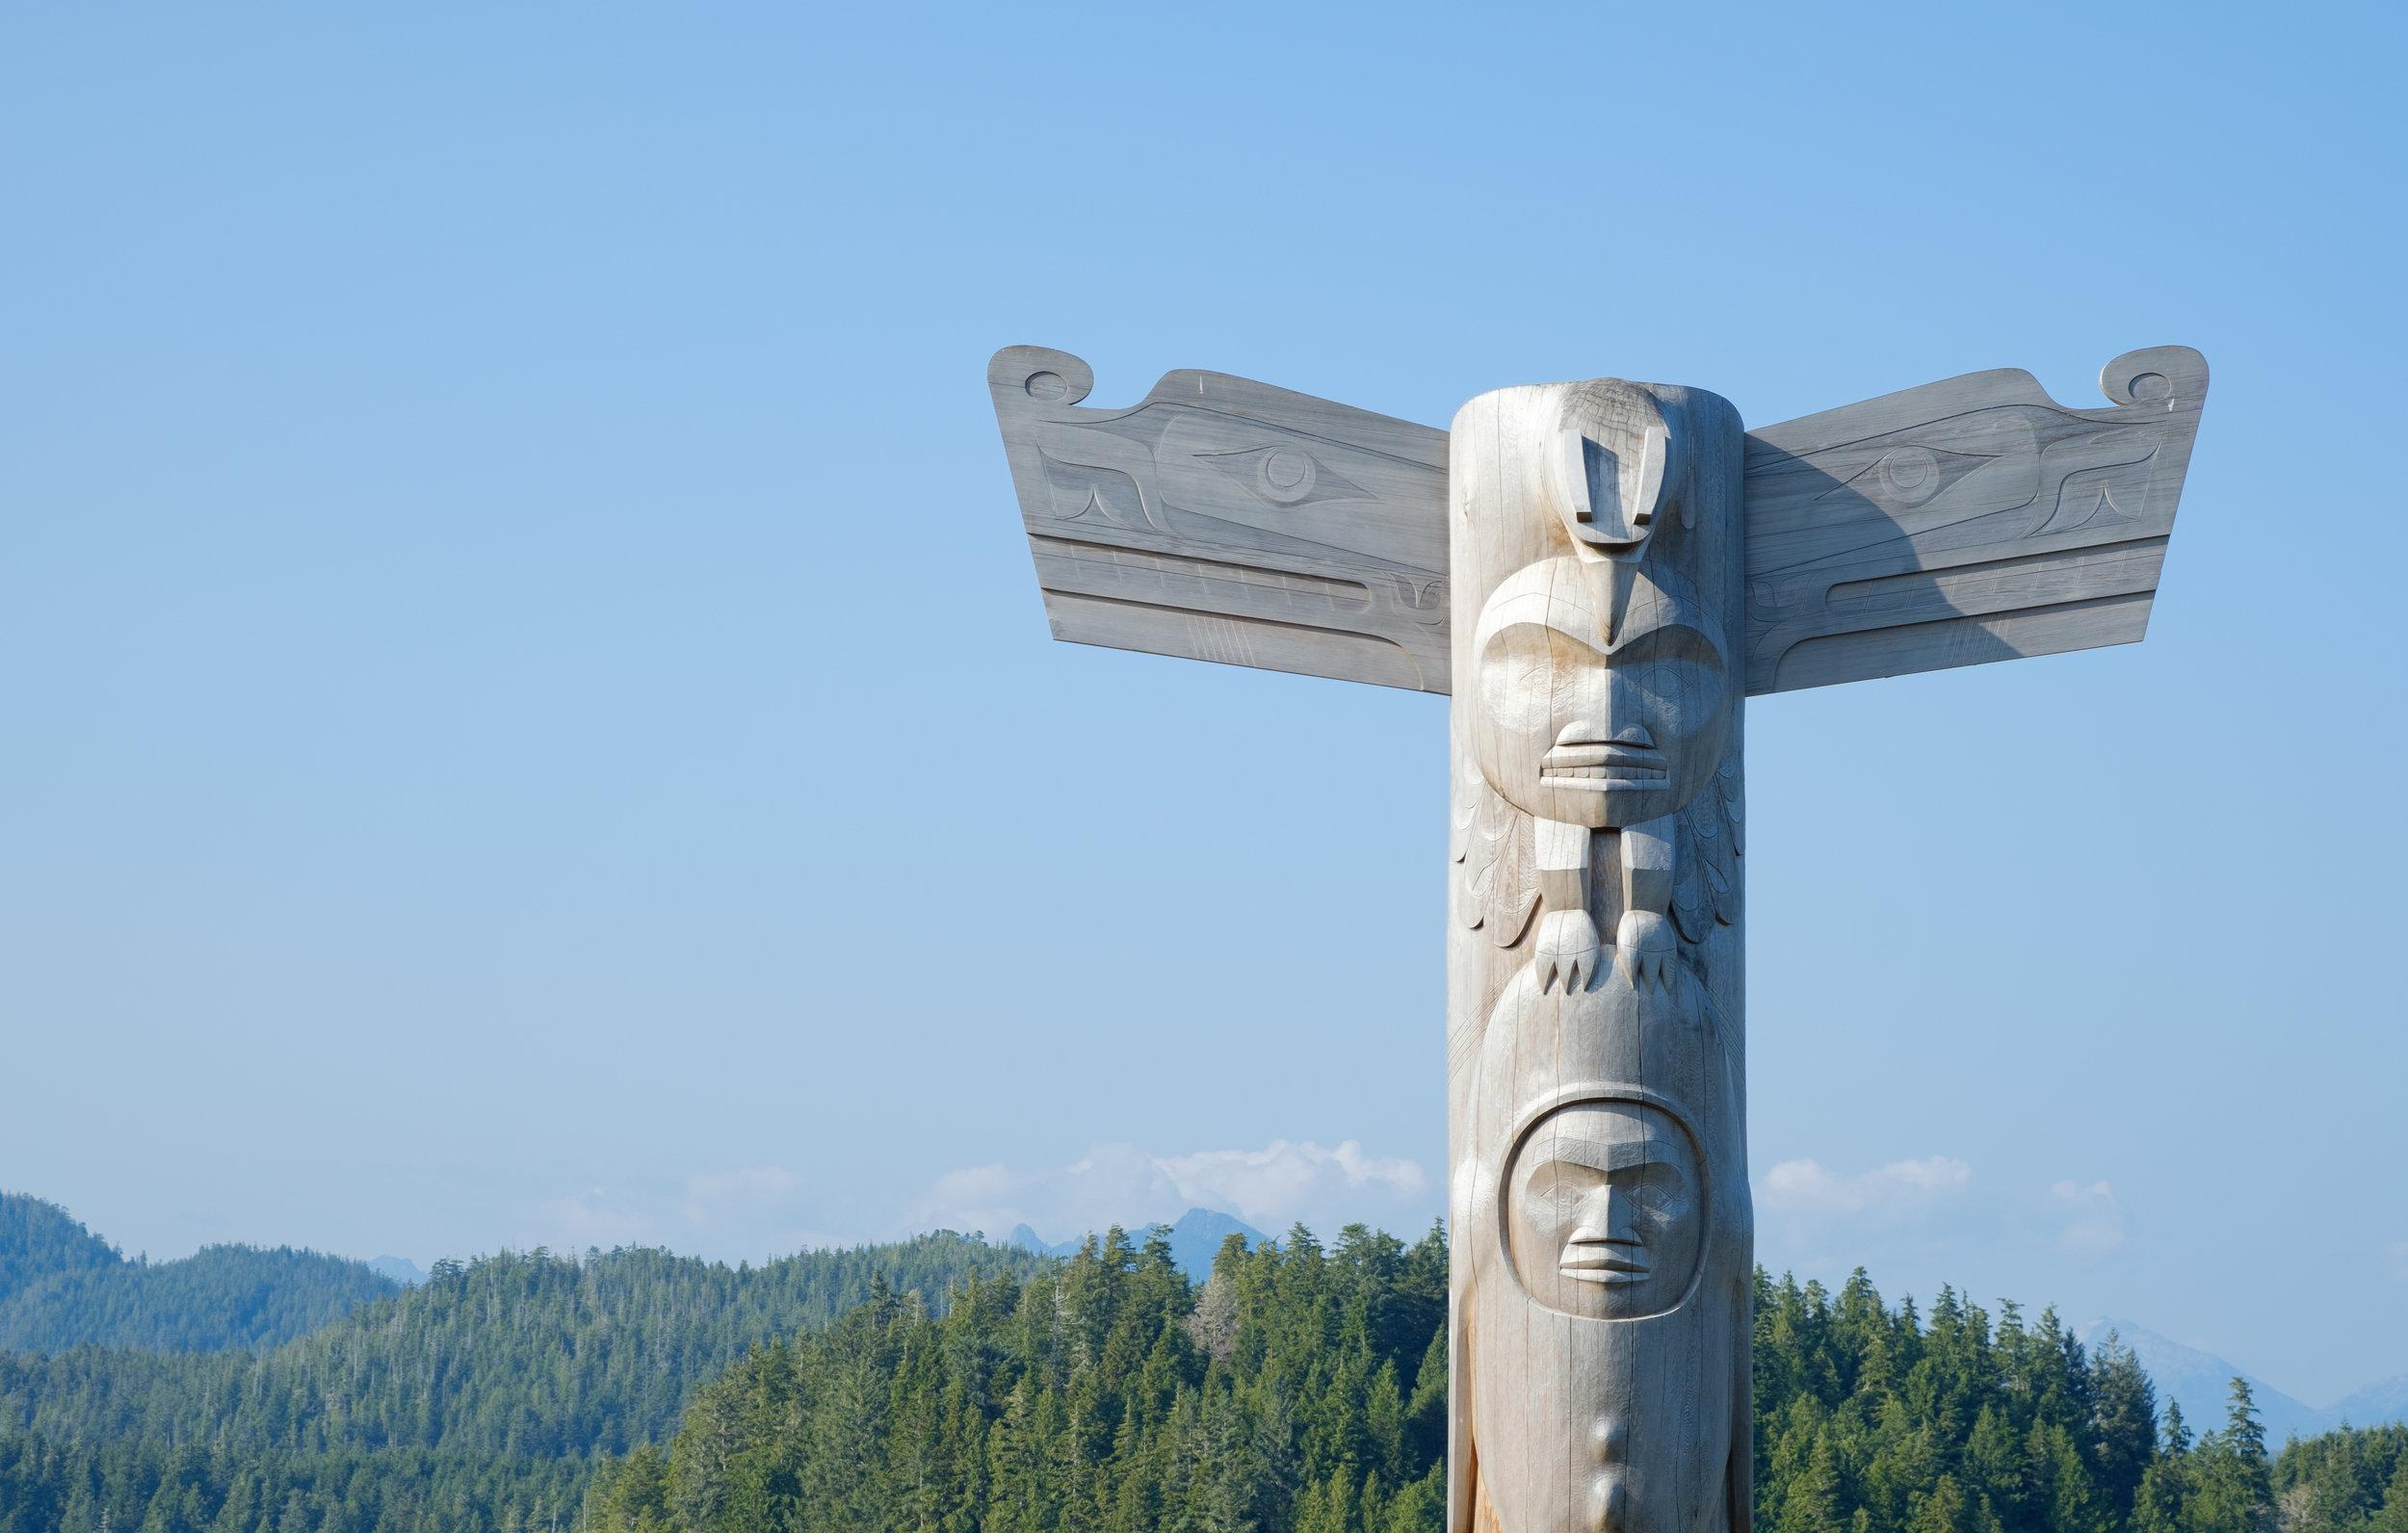 Totem pole at Anchor Park carved by Joe David